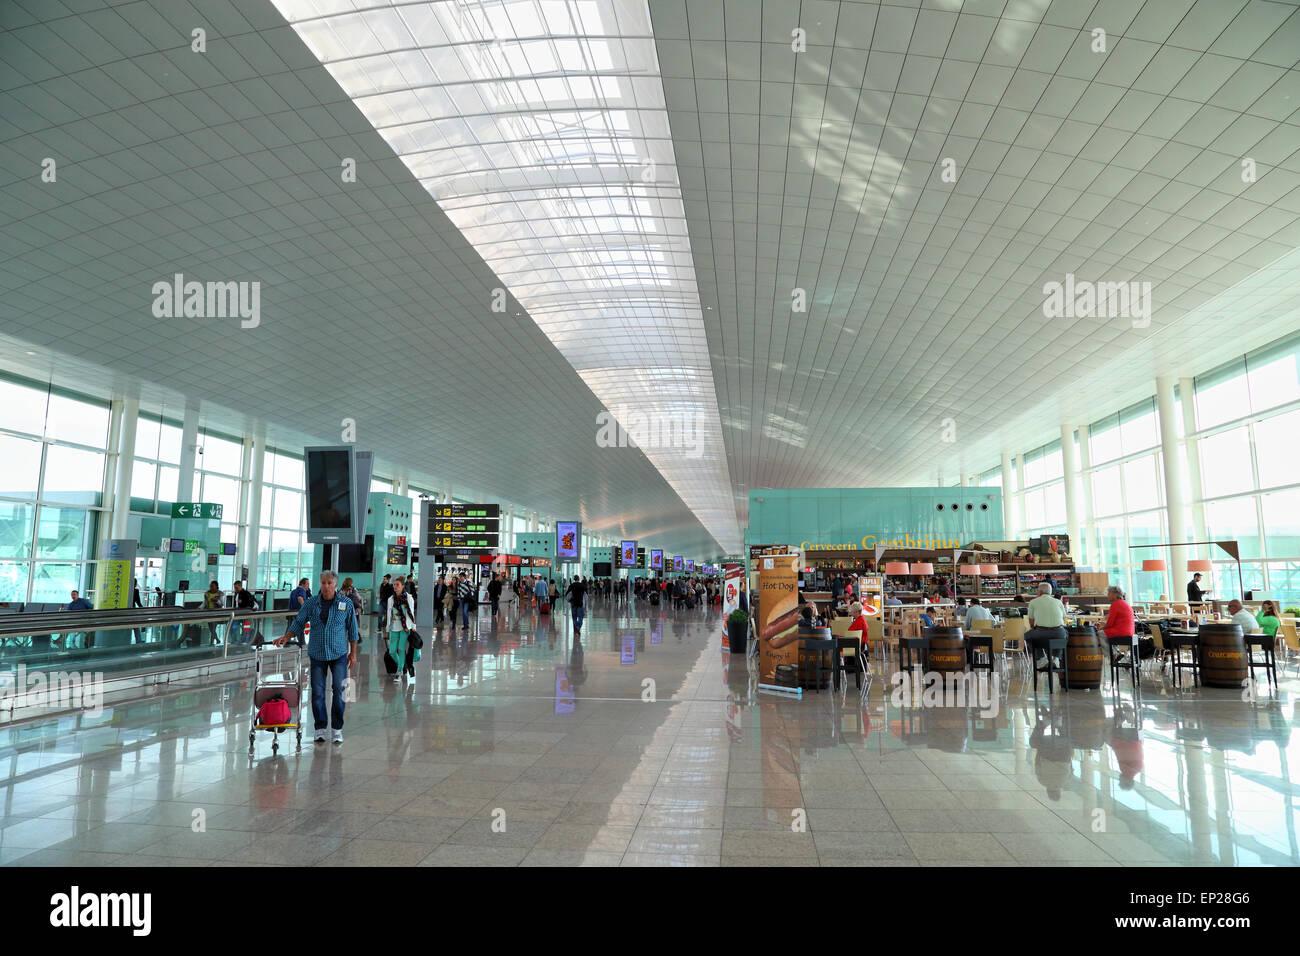 The new Terminal T1 at Barcelona El Prat Airport BCN - Stock Image